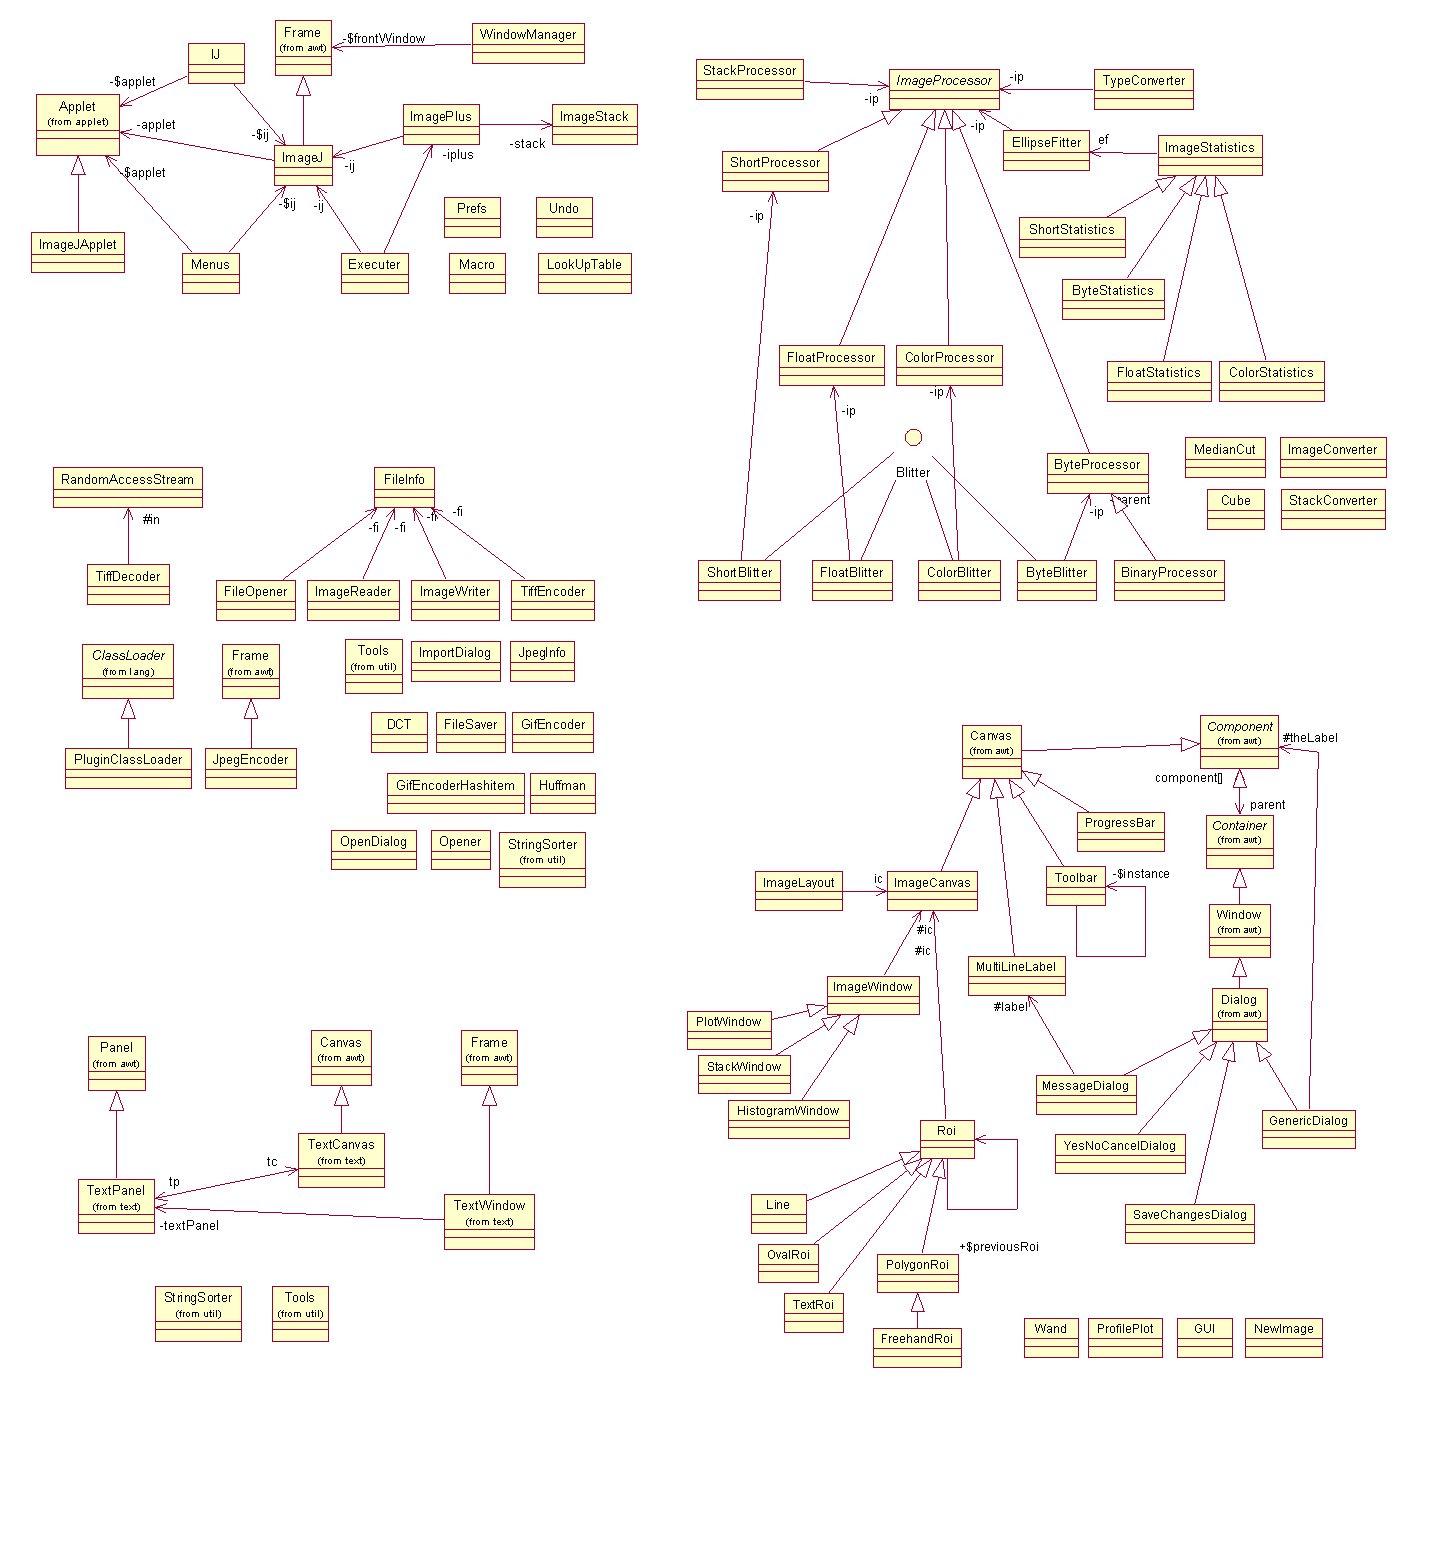 Reproducing uml class diagrams using txtuml technical report ijdeveloperclass diagramg ccuart Image collections